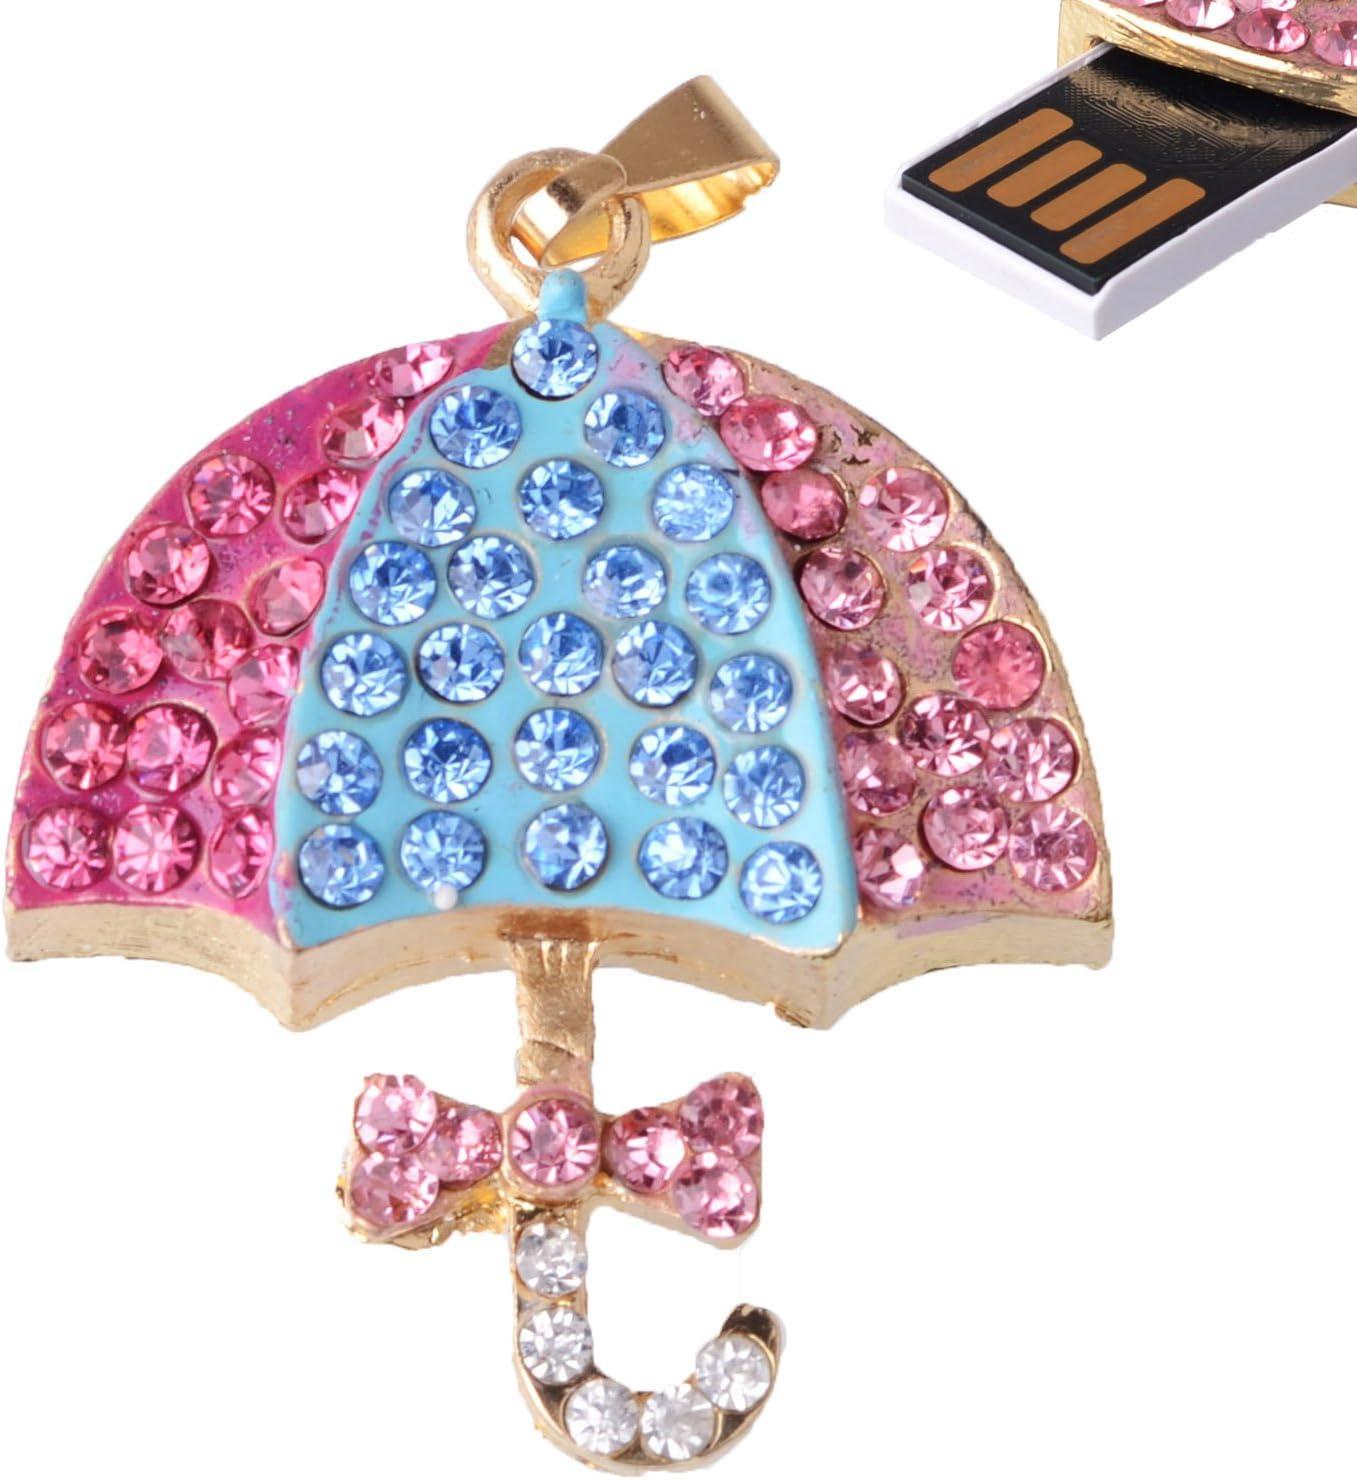 LHN 8GB Crystal Colorful Umbrella USB Flash Drive USB 2.0 with Rhinestones Pink